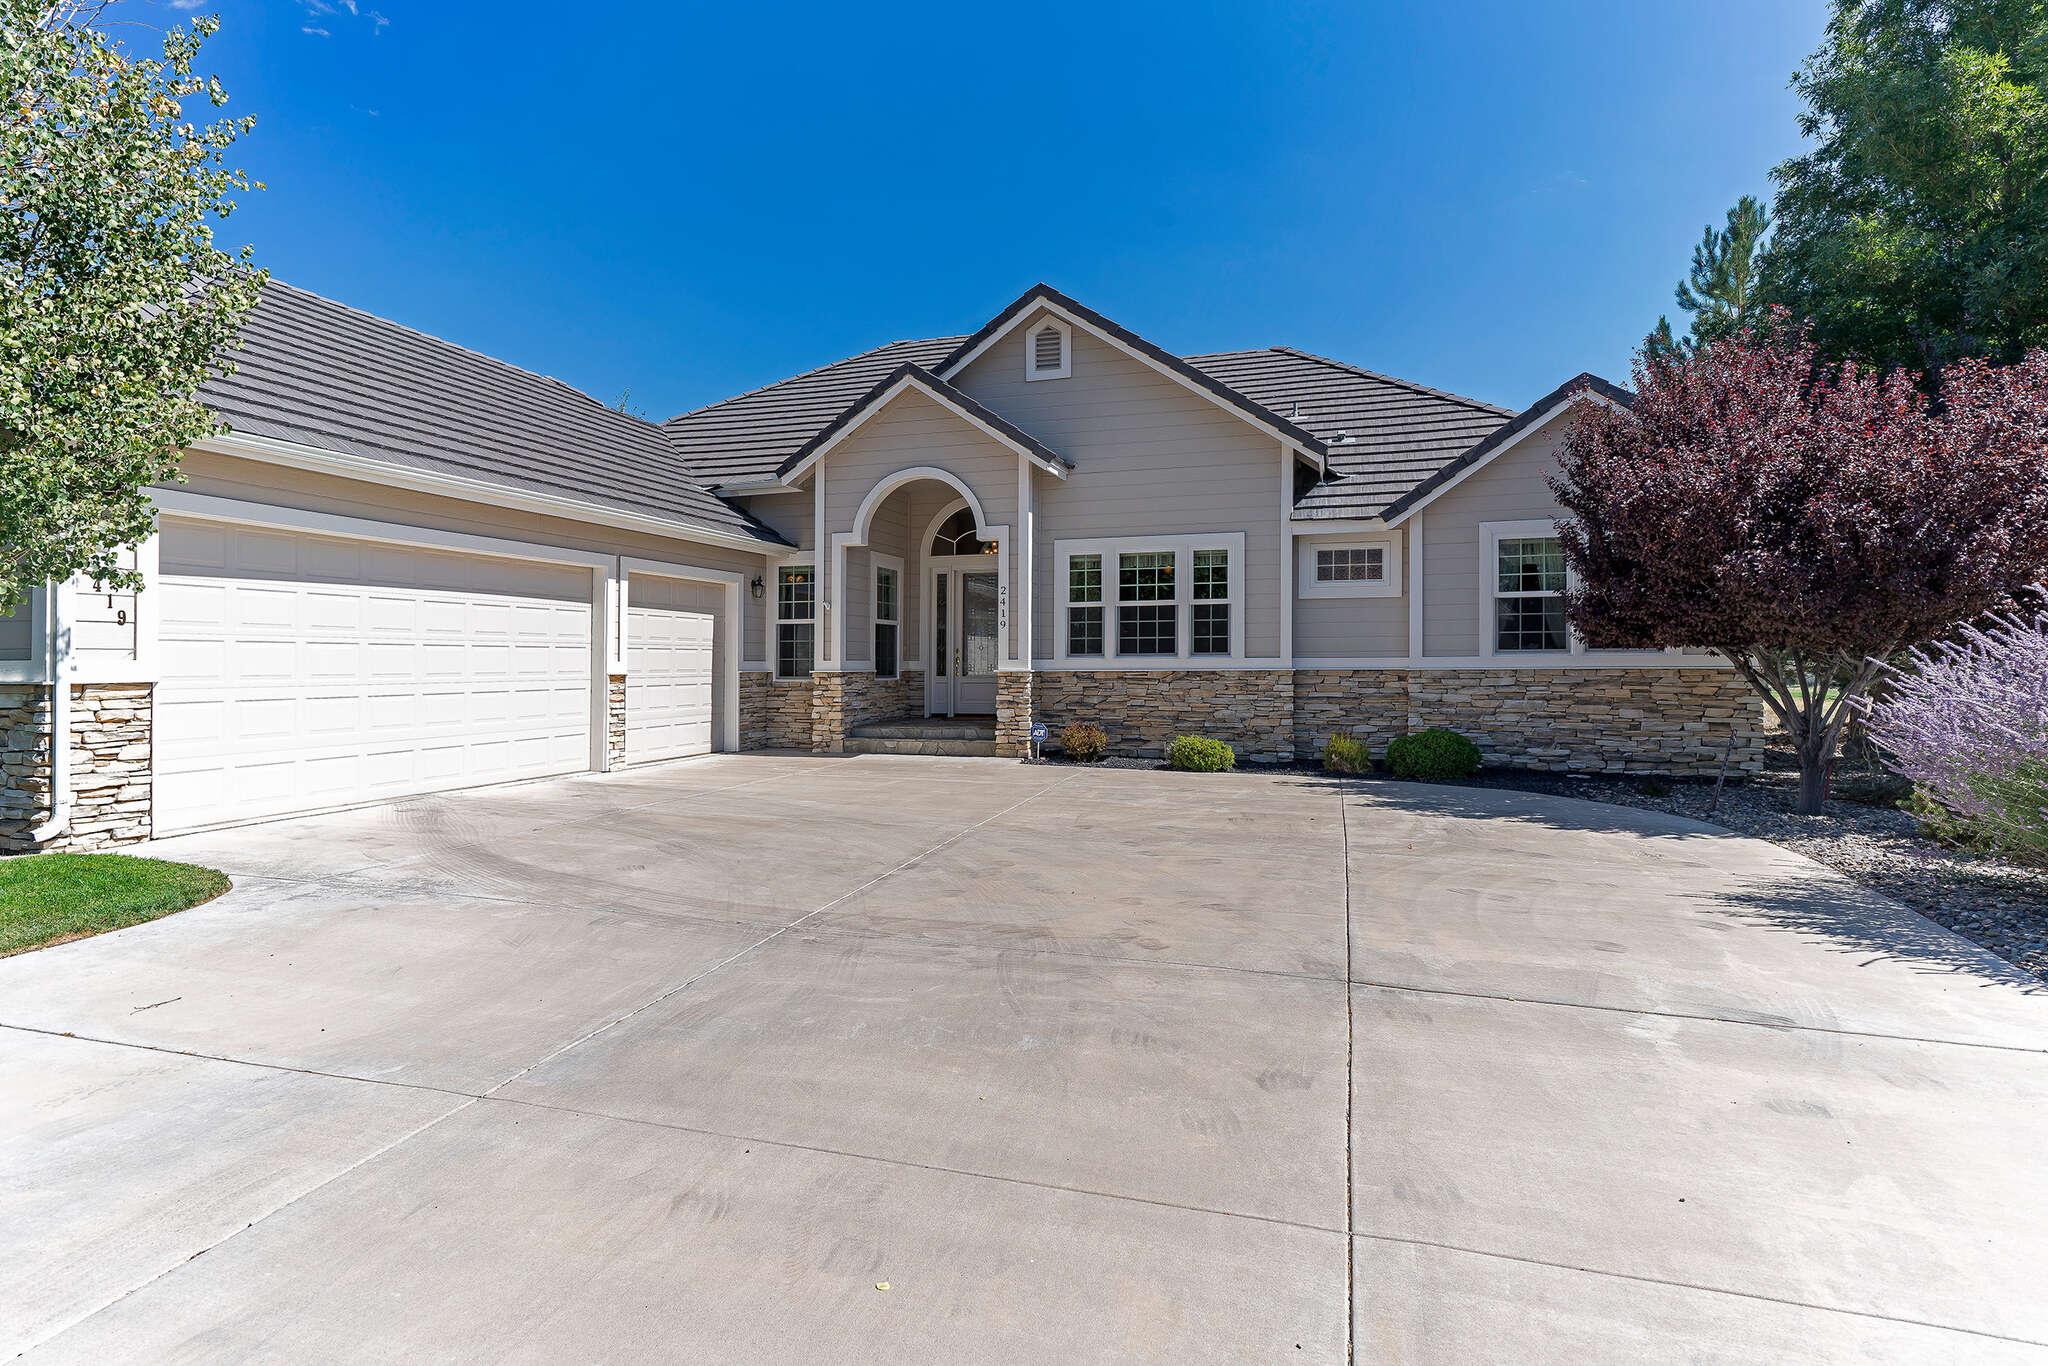 Single Family for Sale at 2419 Genoa Meadows Cir Genoa, Nevada 89411 United States